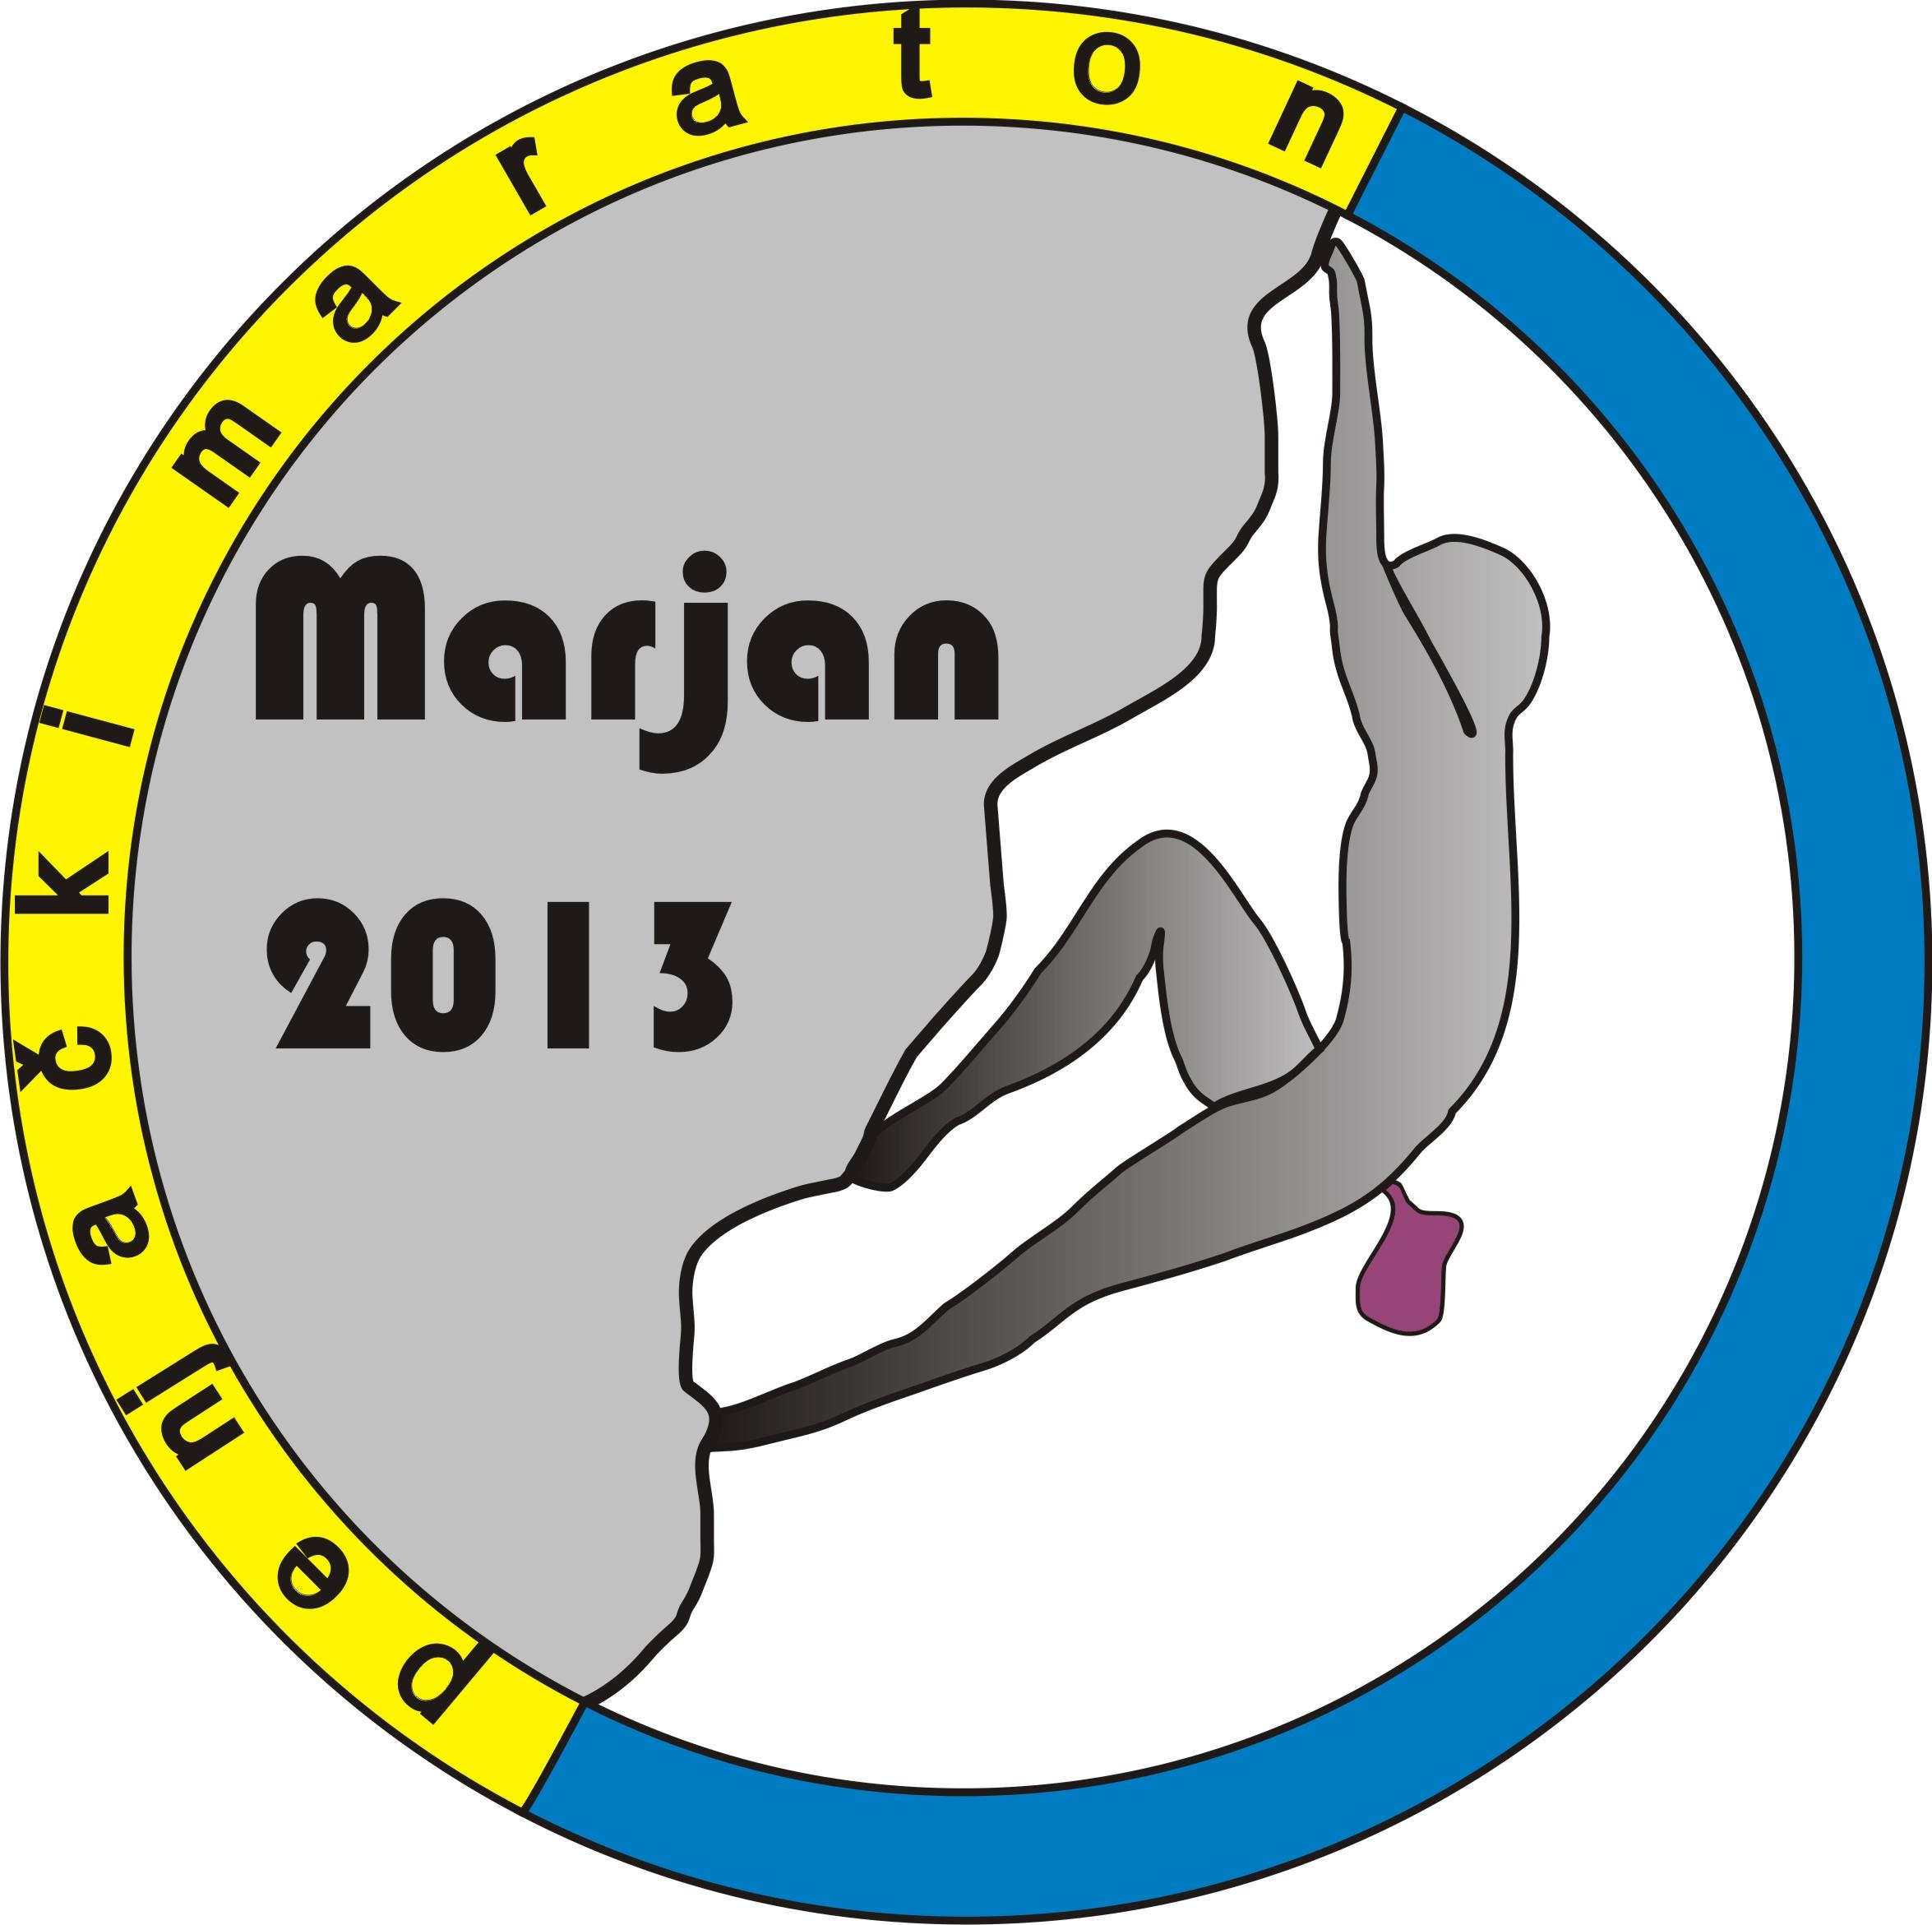 marjan 2013 logo